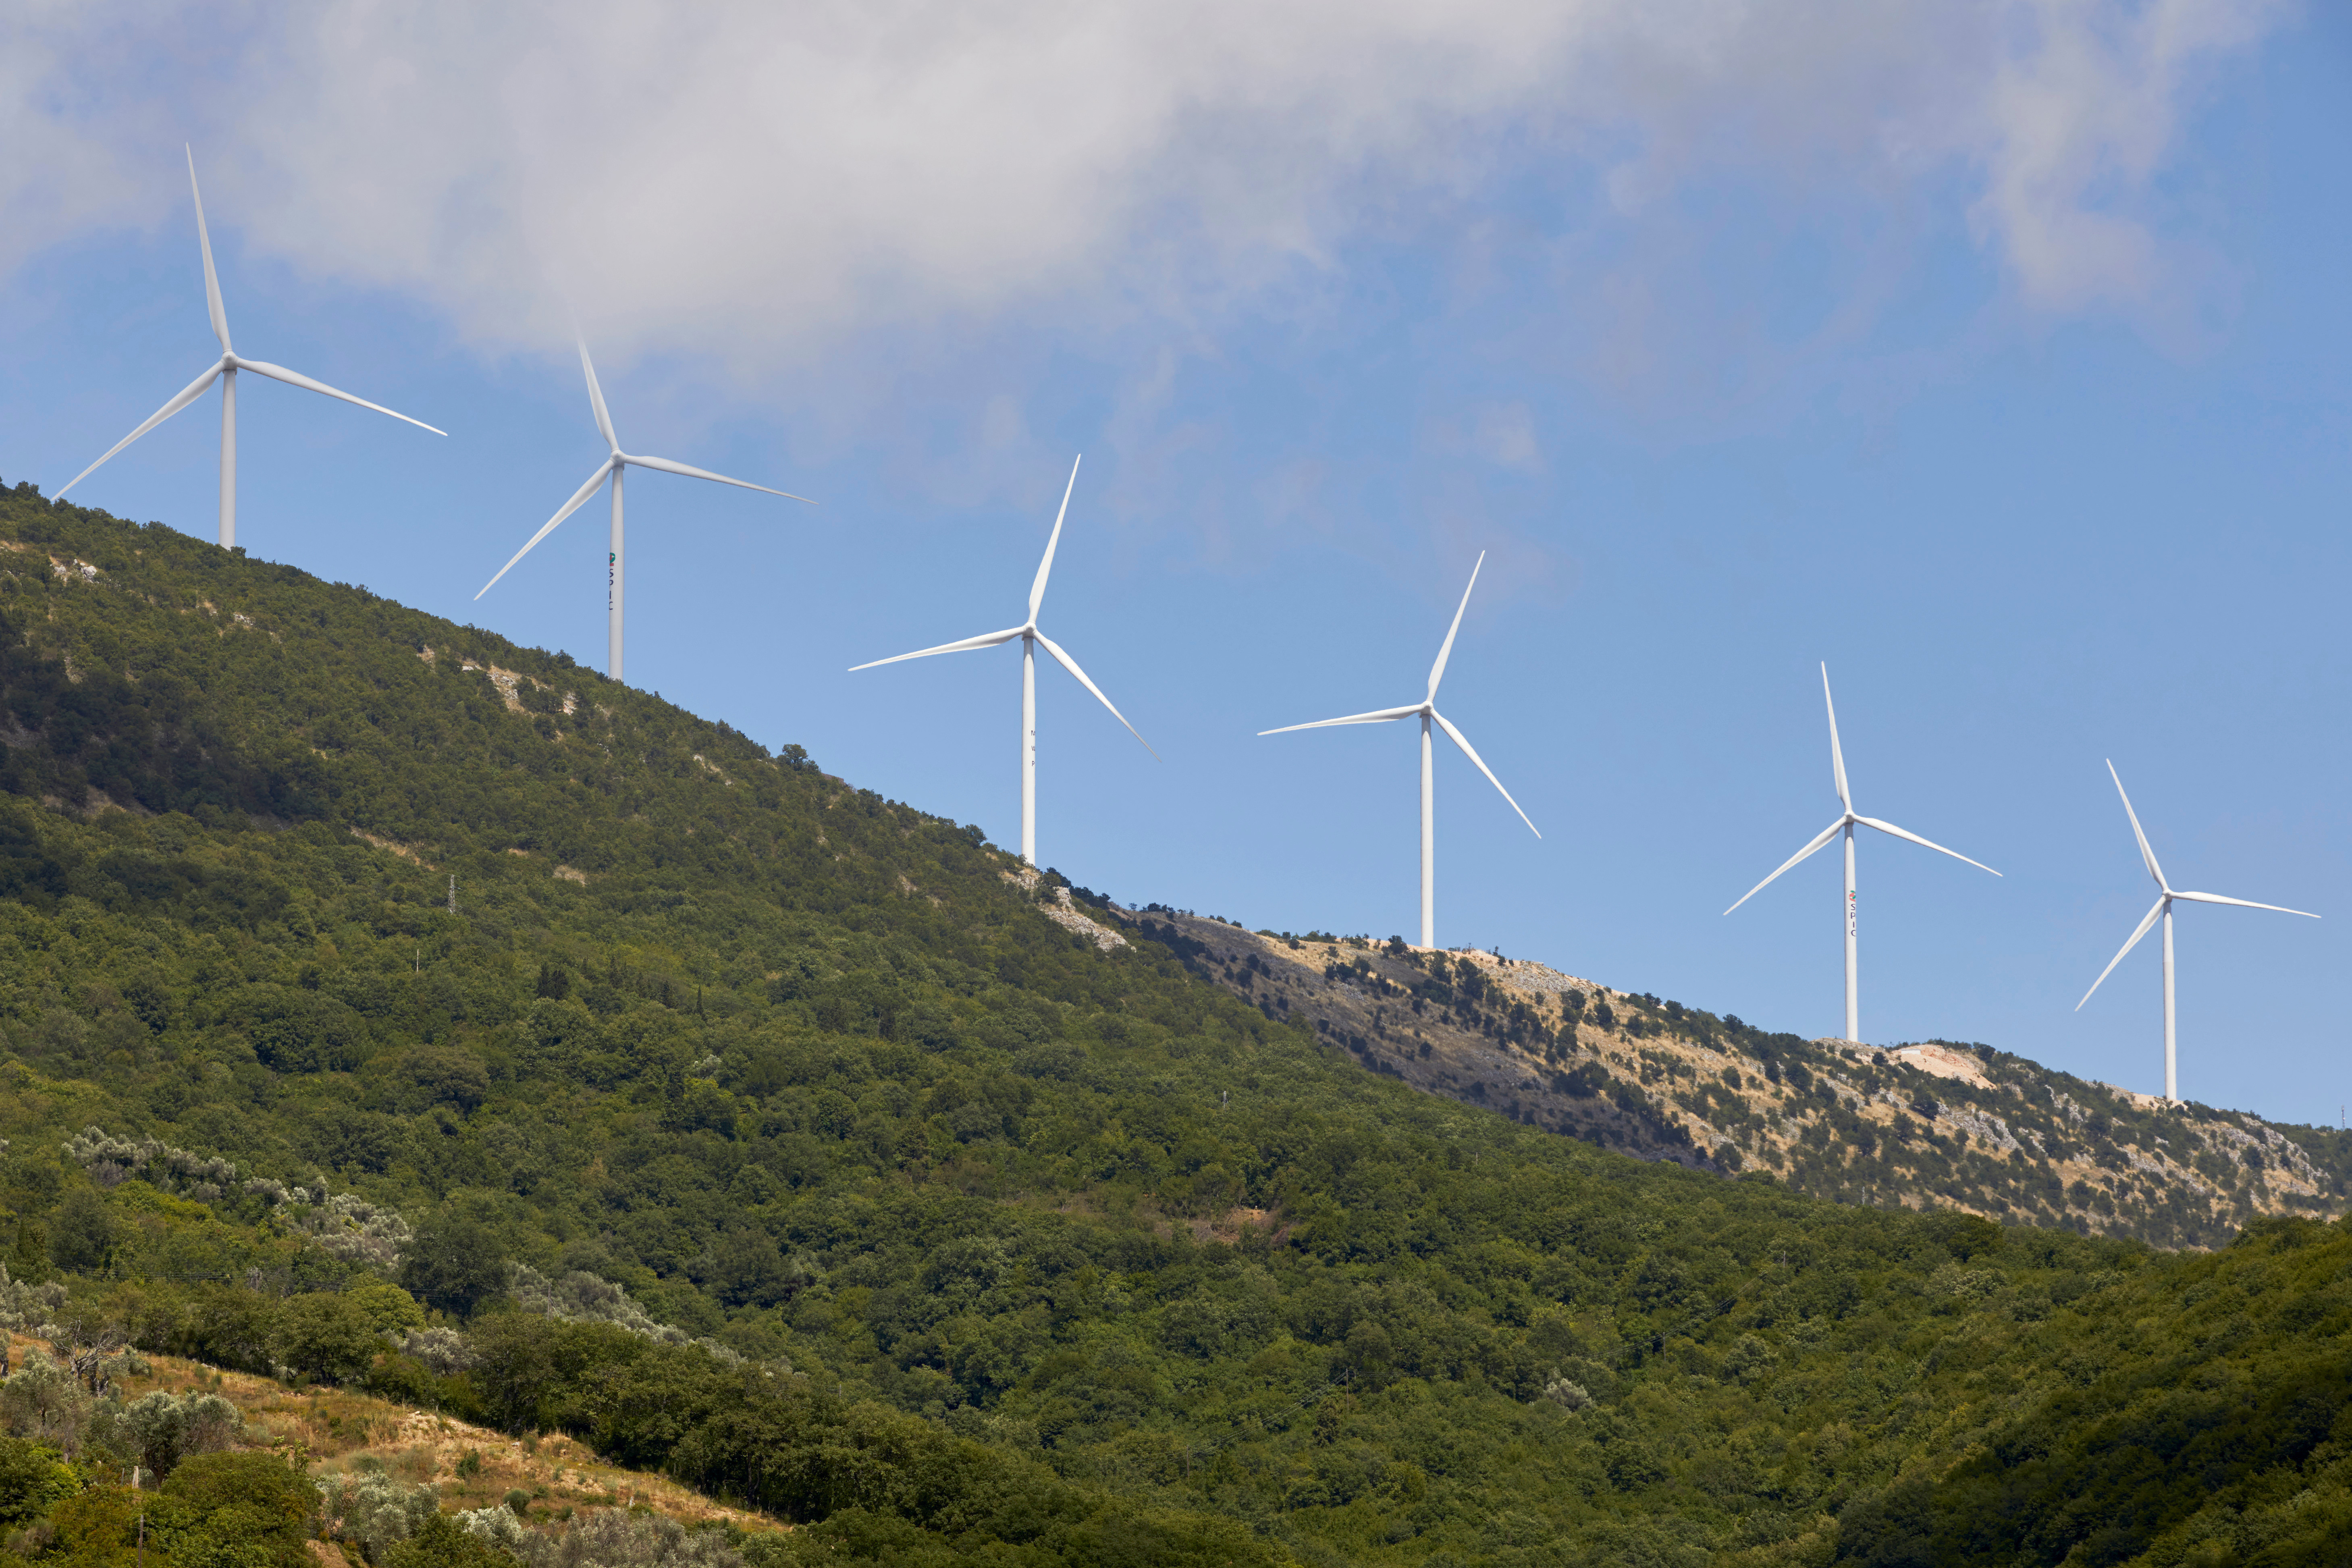 Wind turbines of the Mozura wind farm are seen in Ulcinj, Montenegro, June 18, 2020. Picture taken June 18, 2020.  REUTERS/Stevo Vasiljevic - RC29CH97XBV4